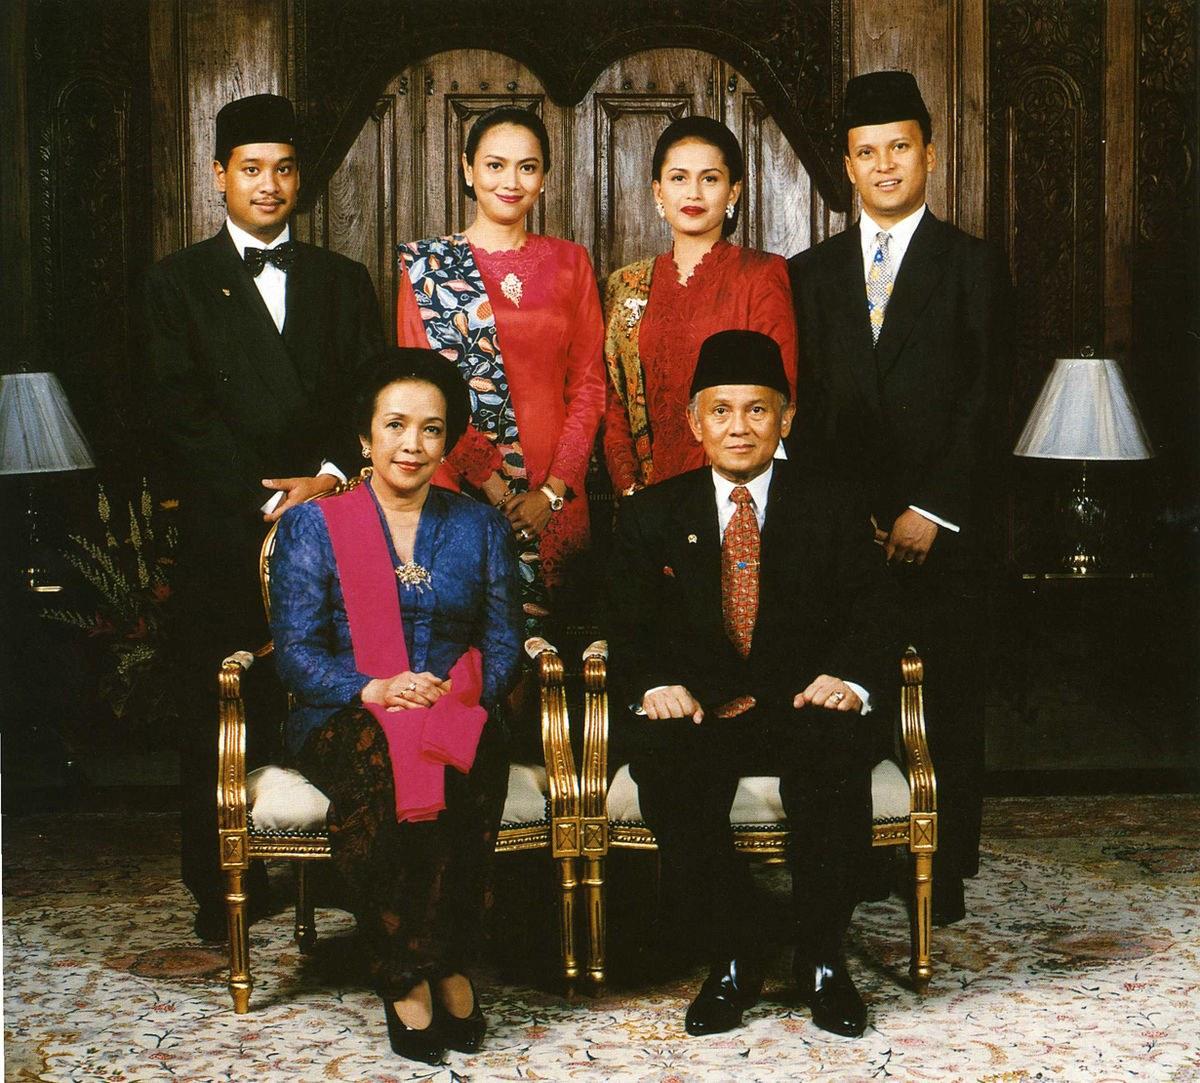 Inspirasi Gaun Pengantin Muslim Adat Jawa Budm National Costume Of Indonesia